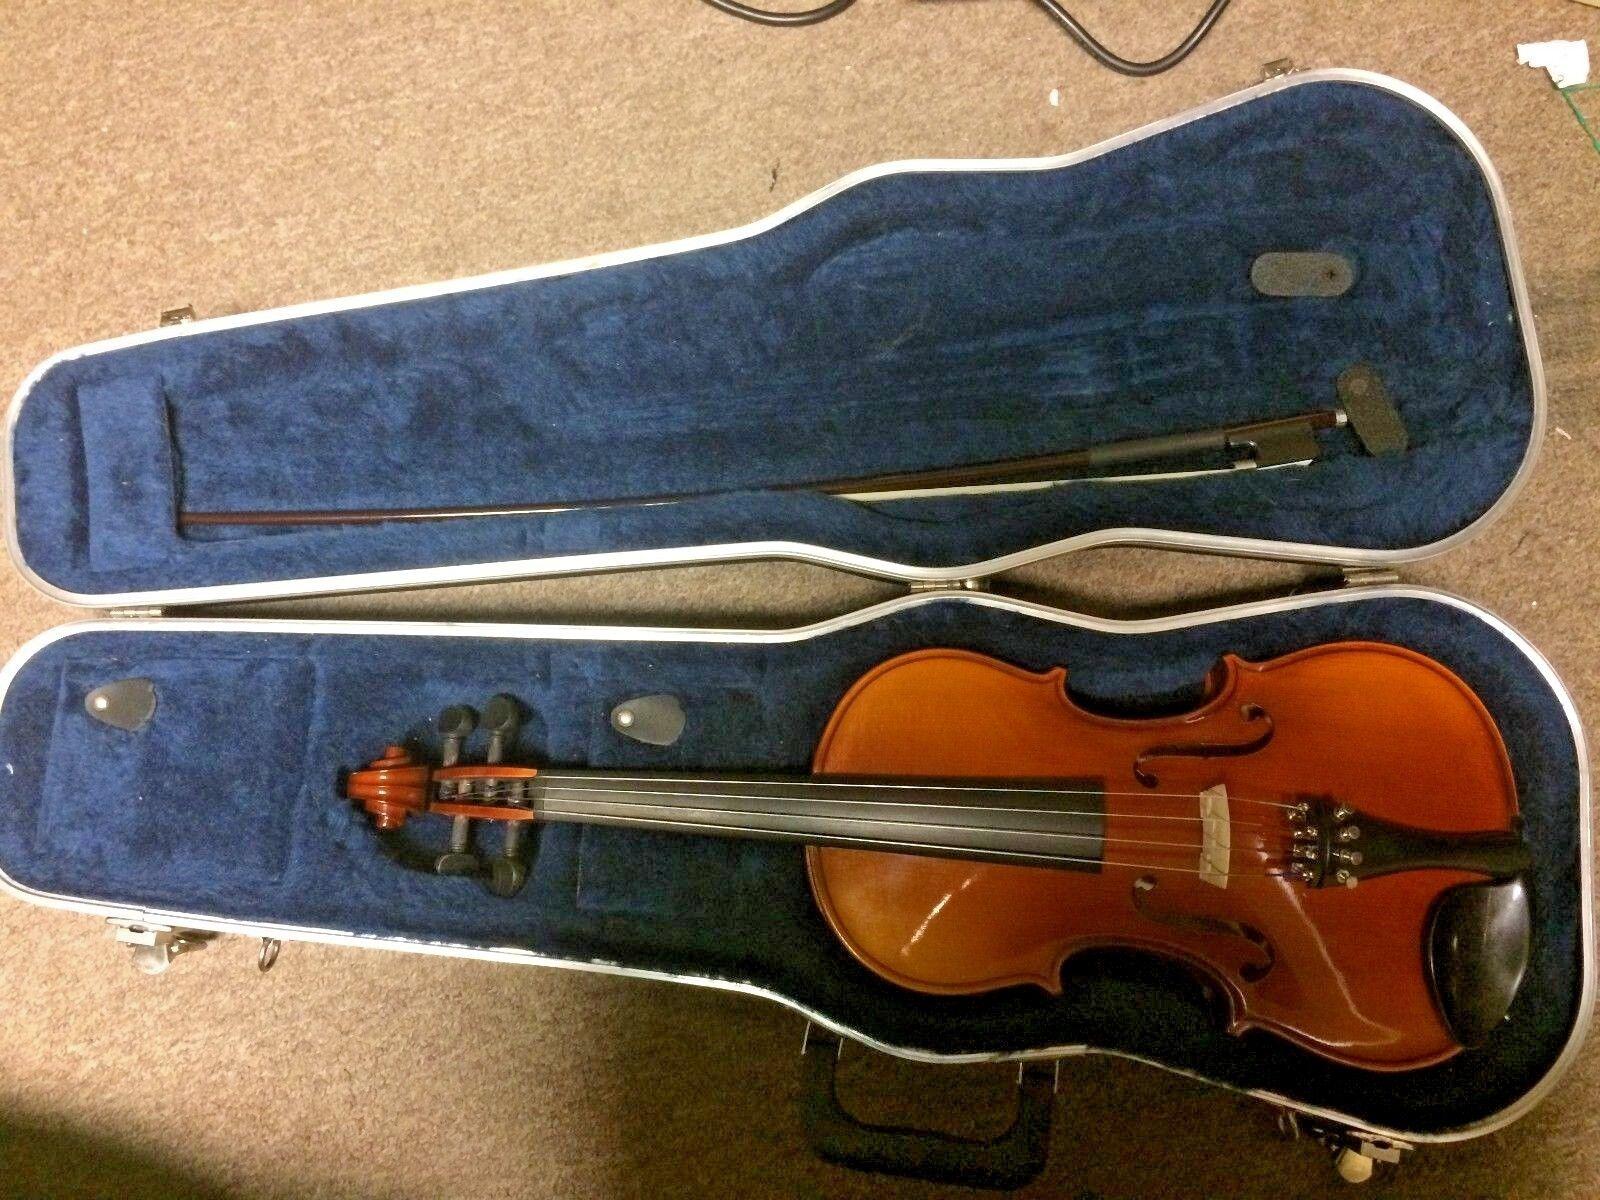 Romanian 4 4 Violin (Used) DG688